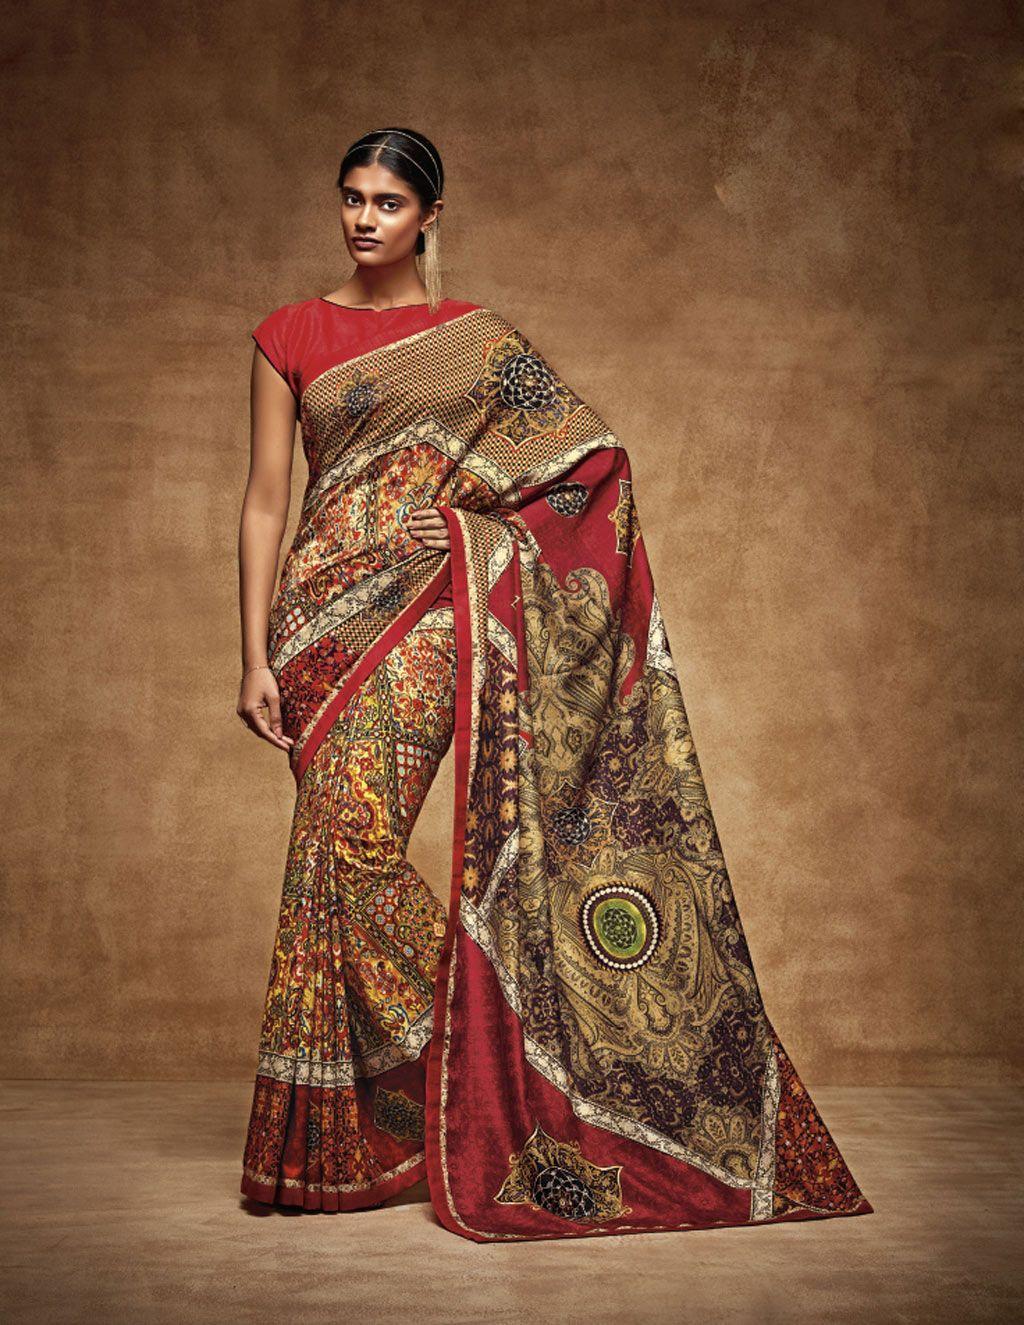 Design of saree blouse red tussar art silk printed saree with blouse   fashion